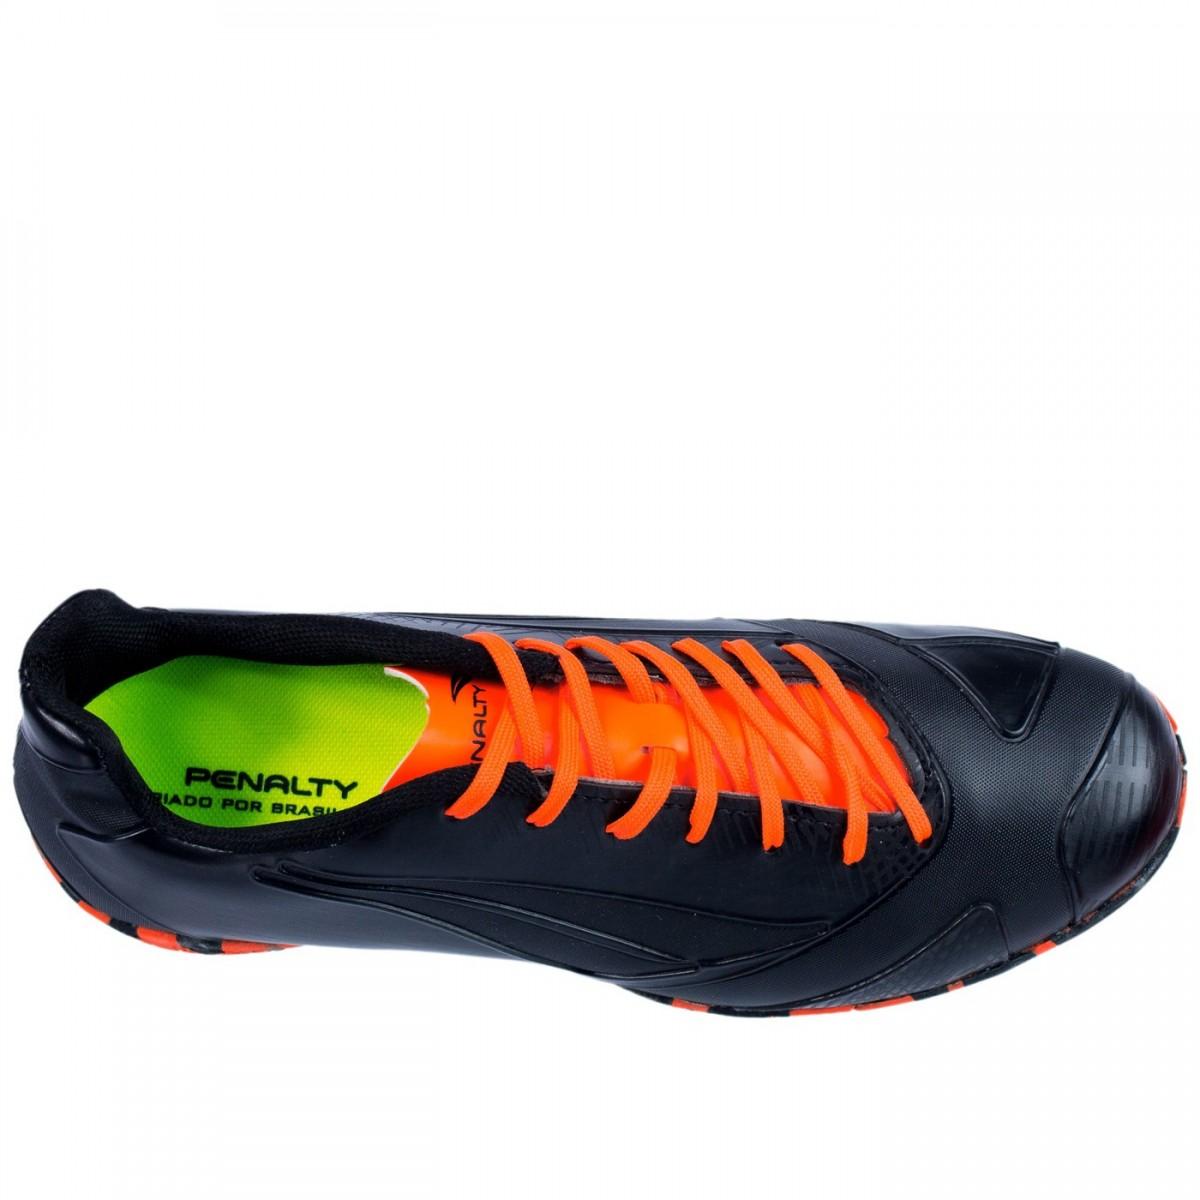 fb69a7d521 Chuteira Penalty Futsal